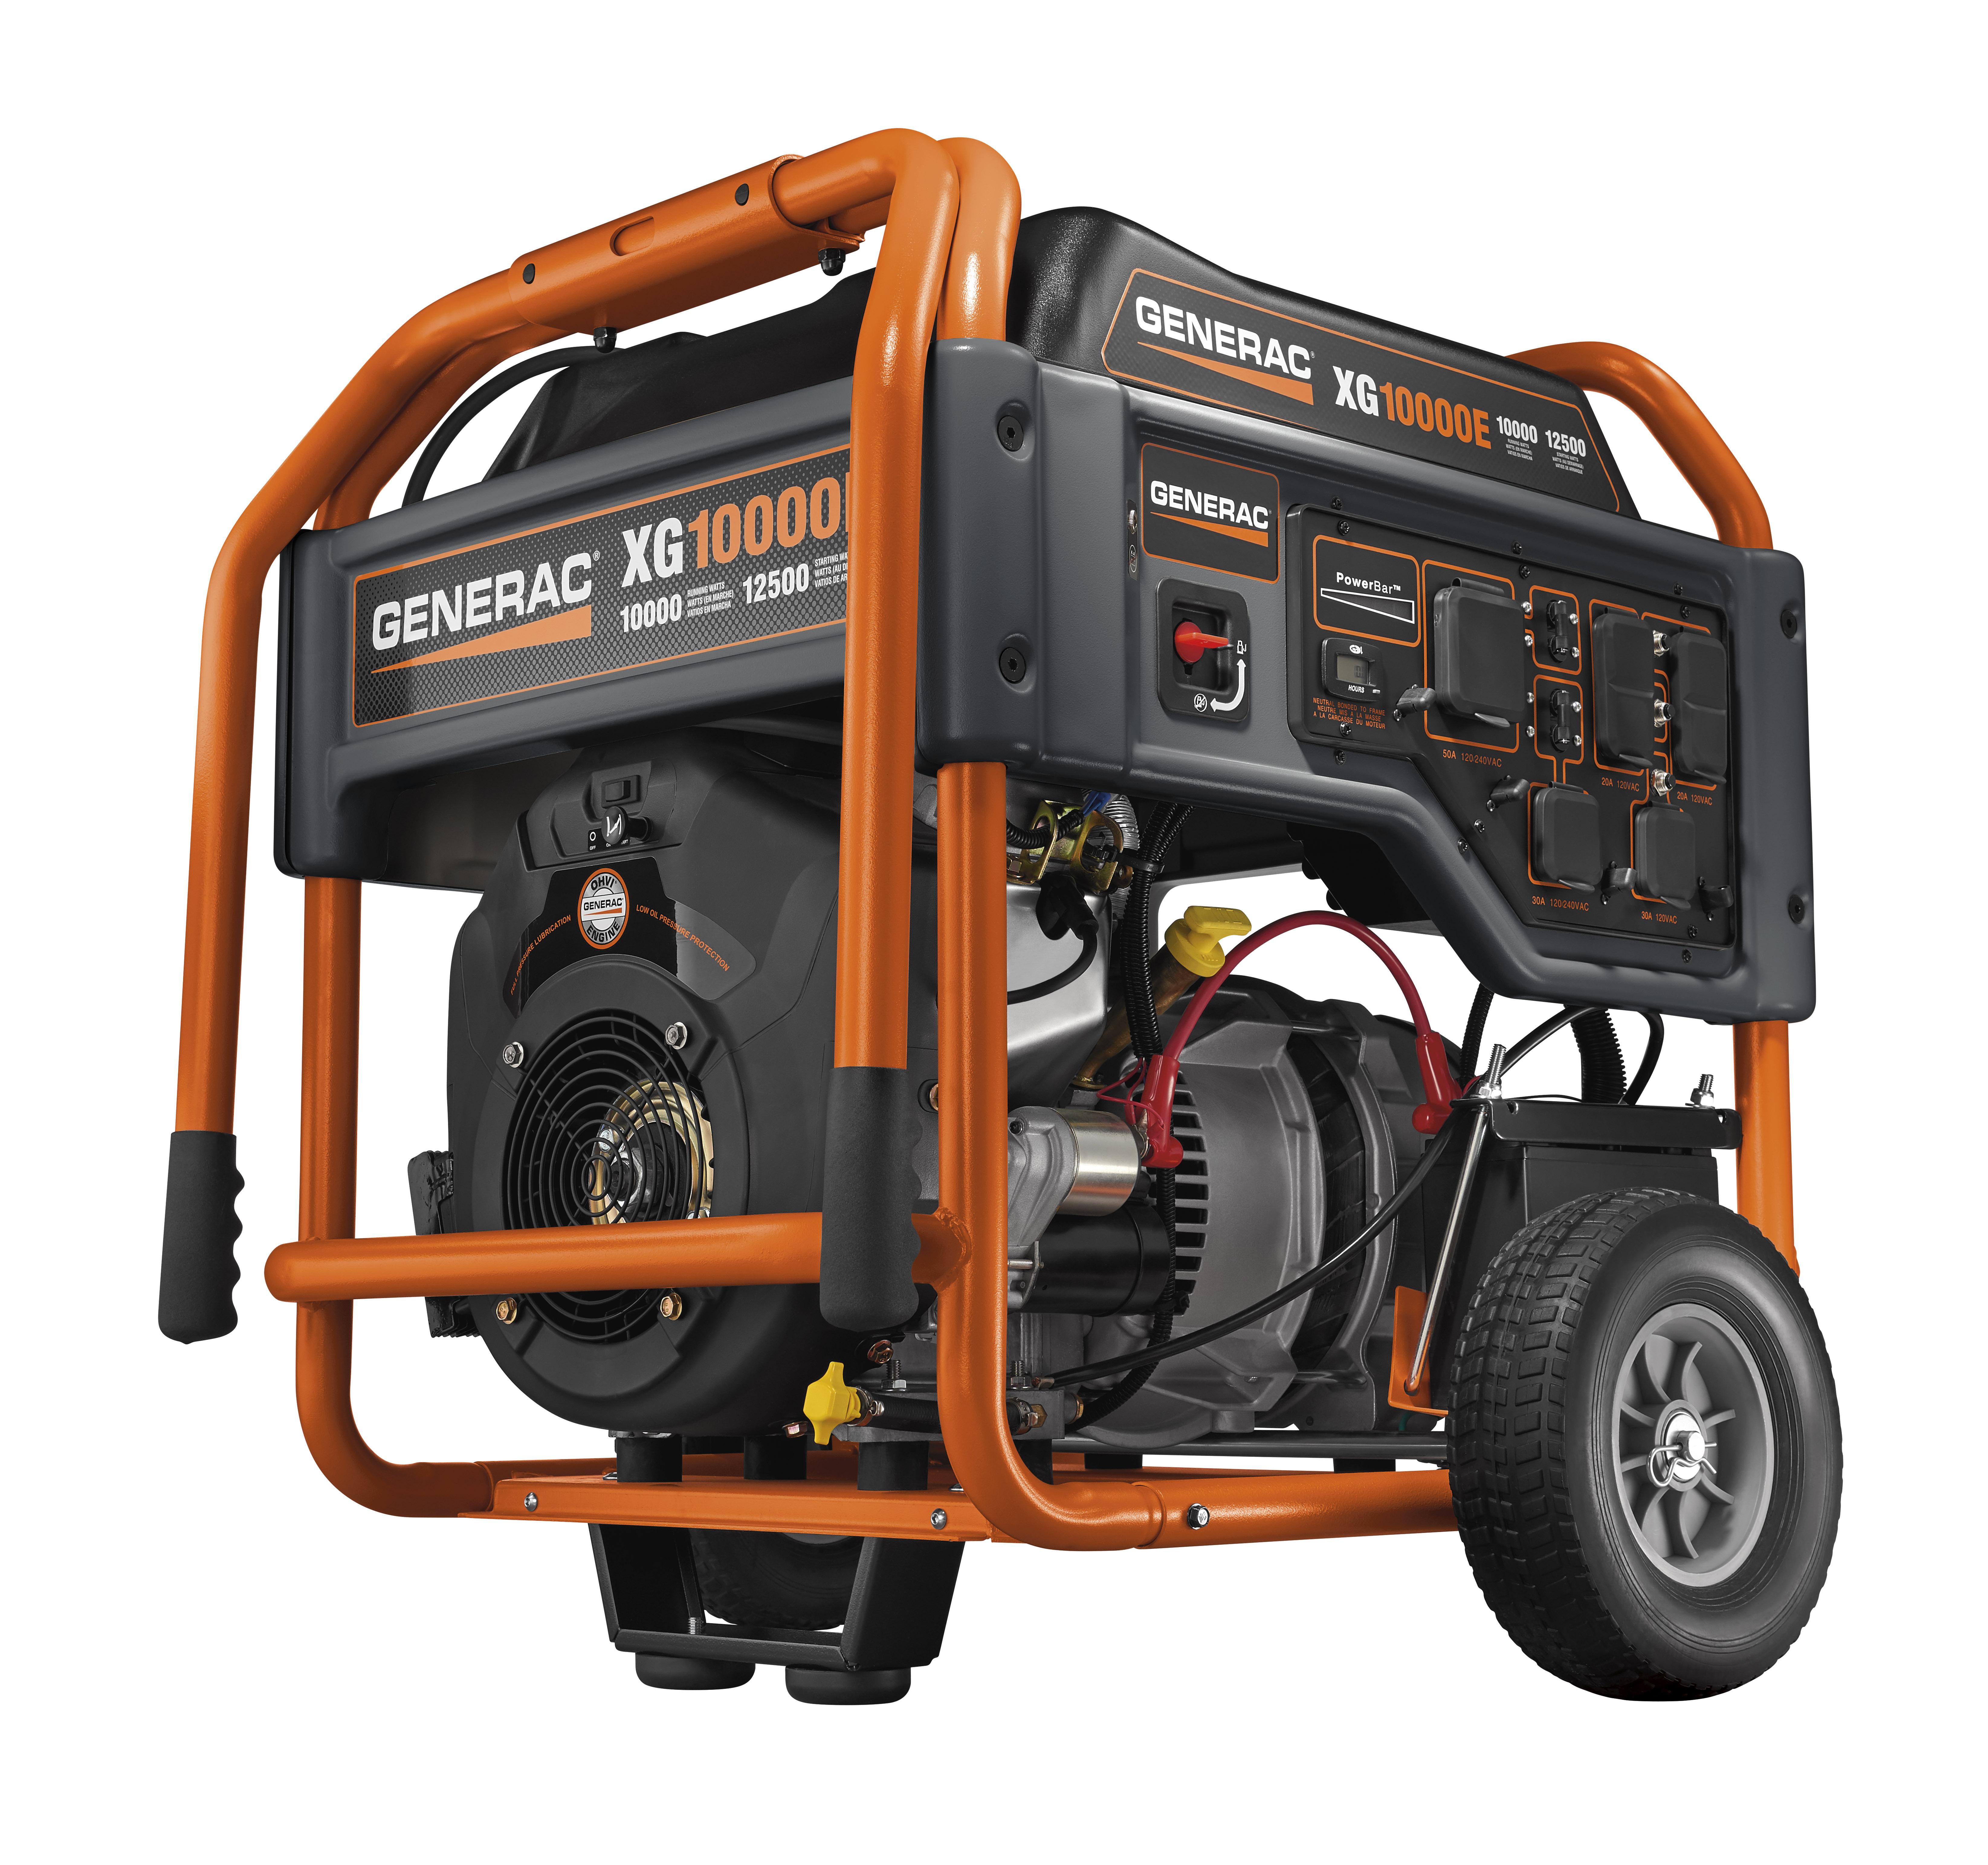 generac power systems - 10000 watt xg series portable generator with